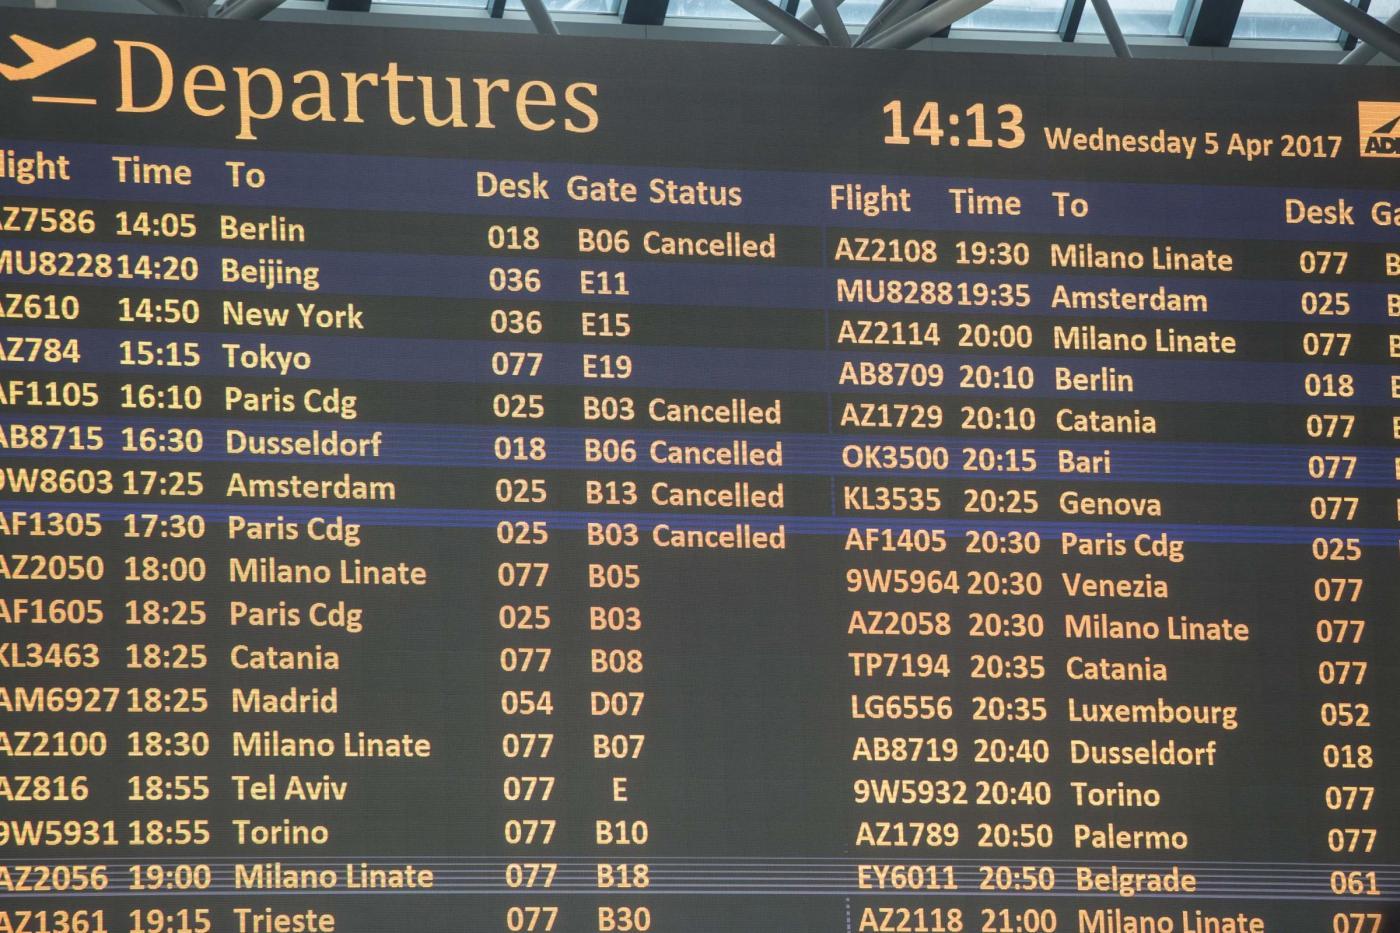 sciopero aerei 21 aprile 2017 alitalia meridiana easyjet